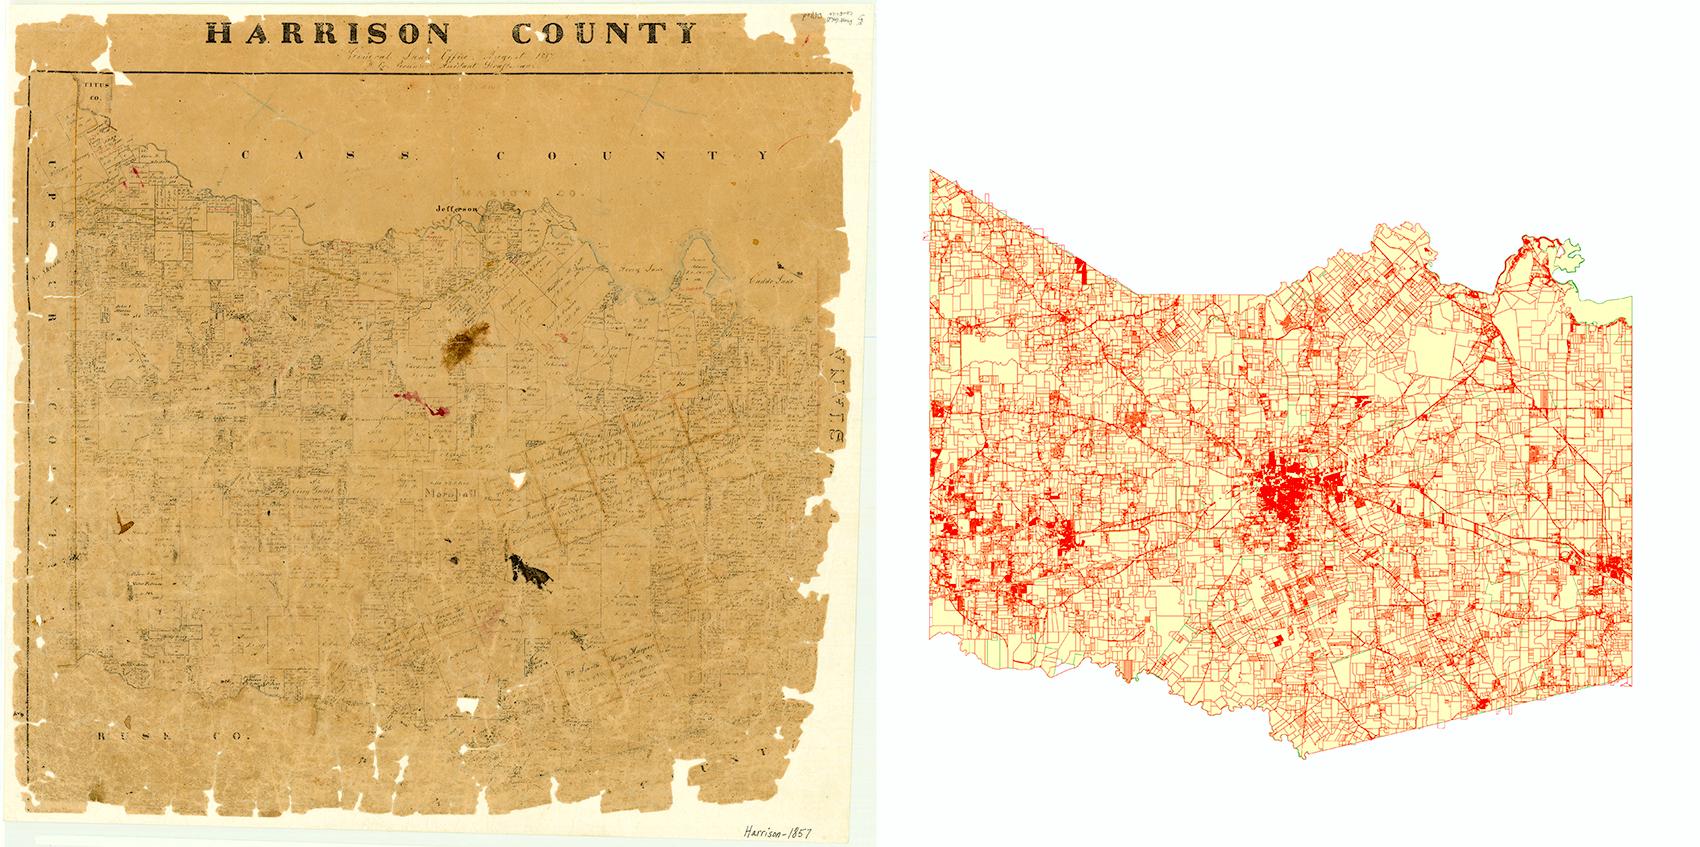 Harrison County Map, 1857 & 2015